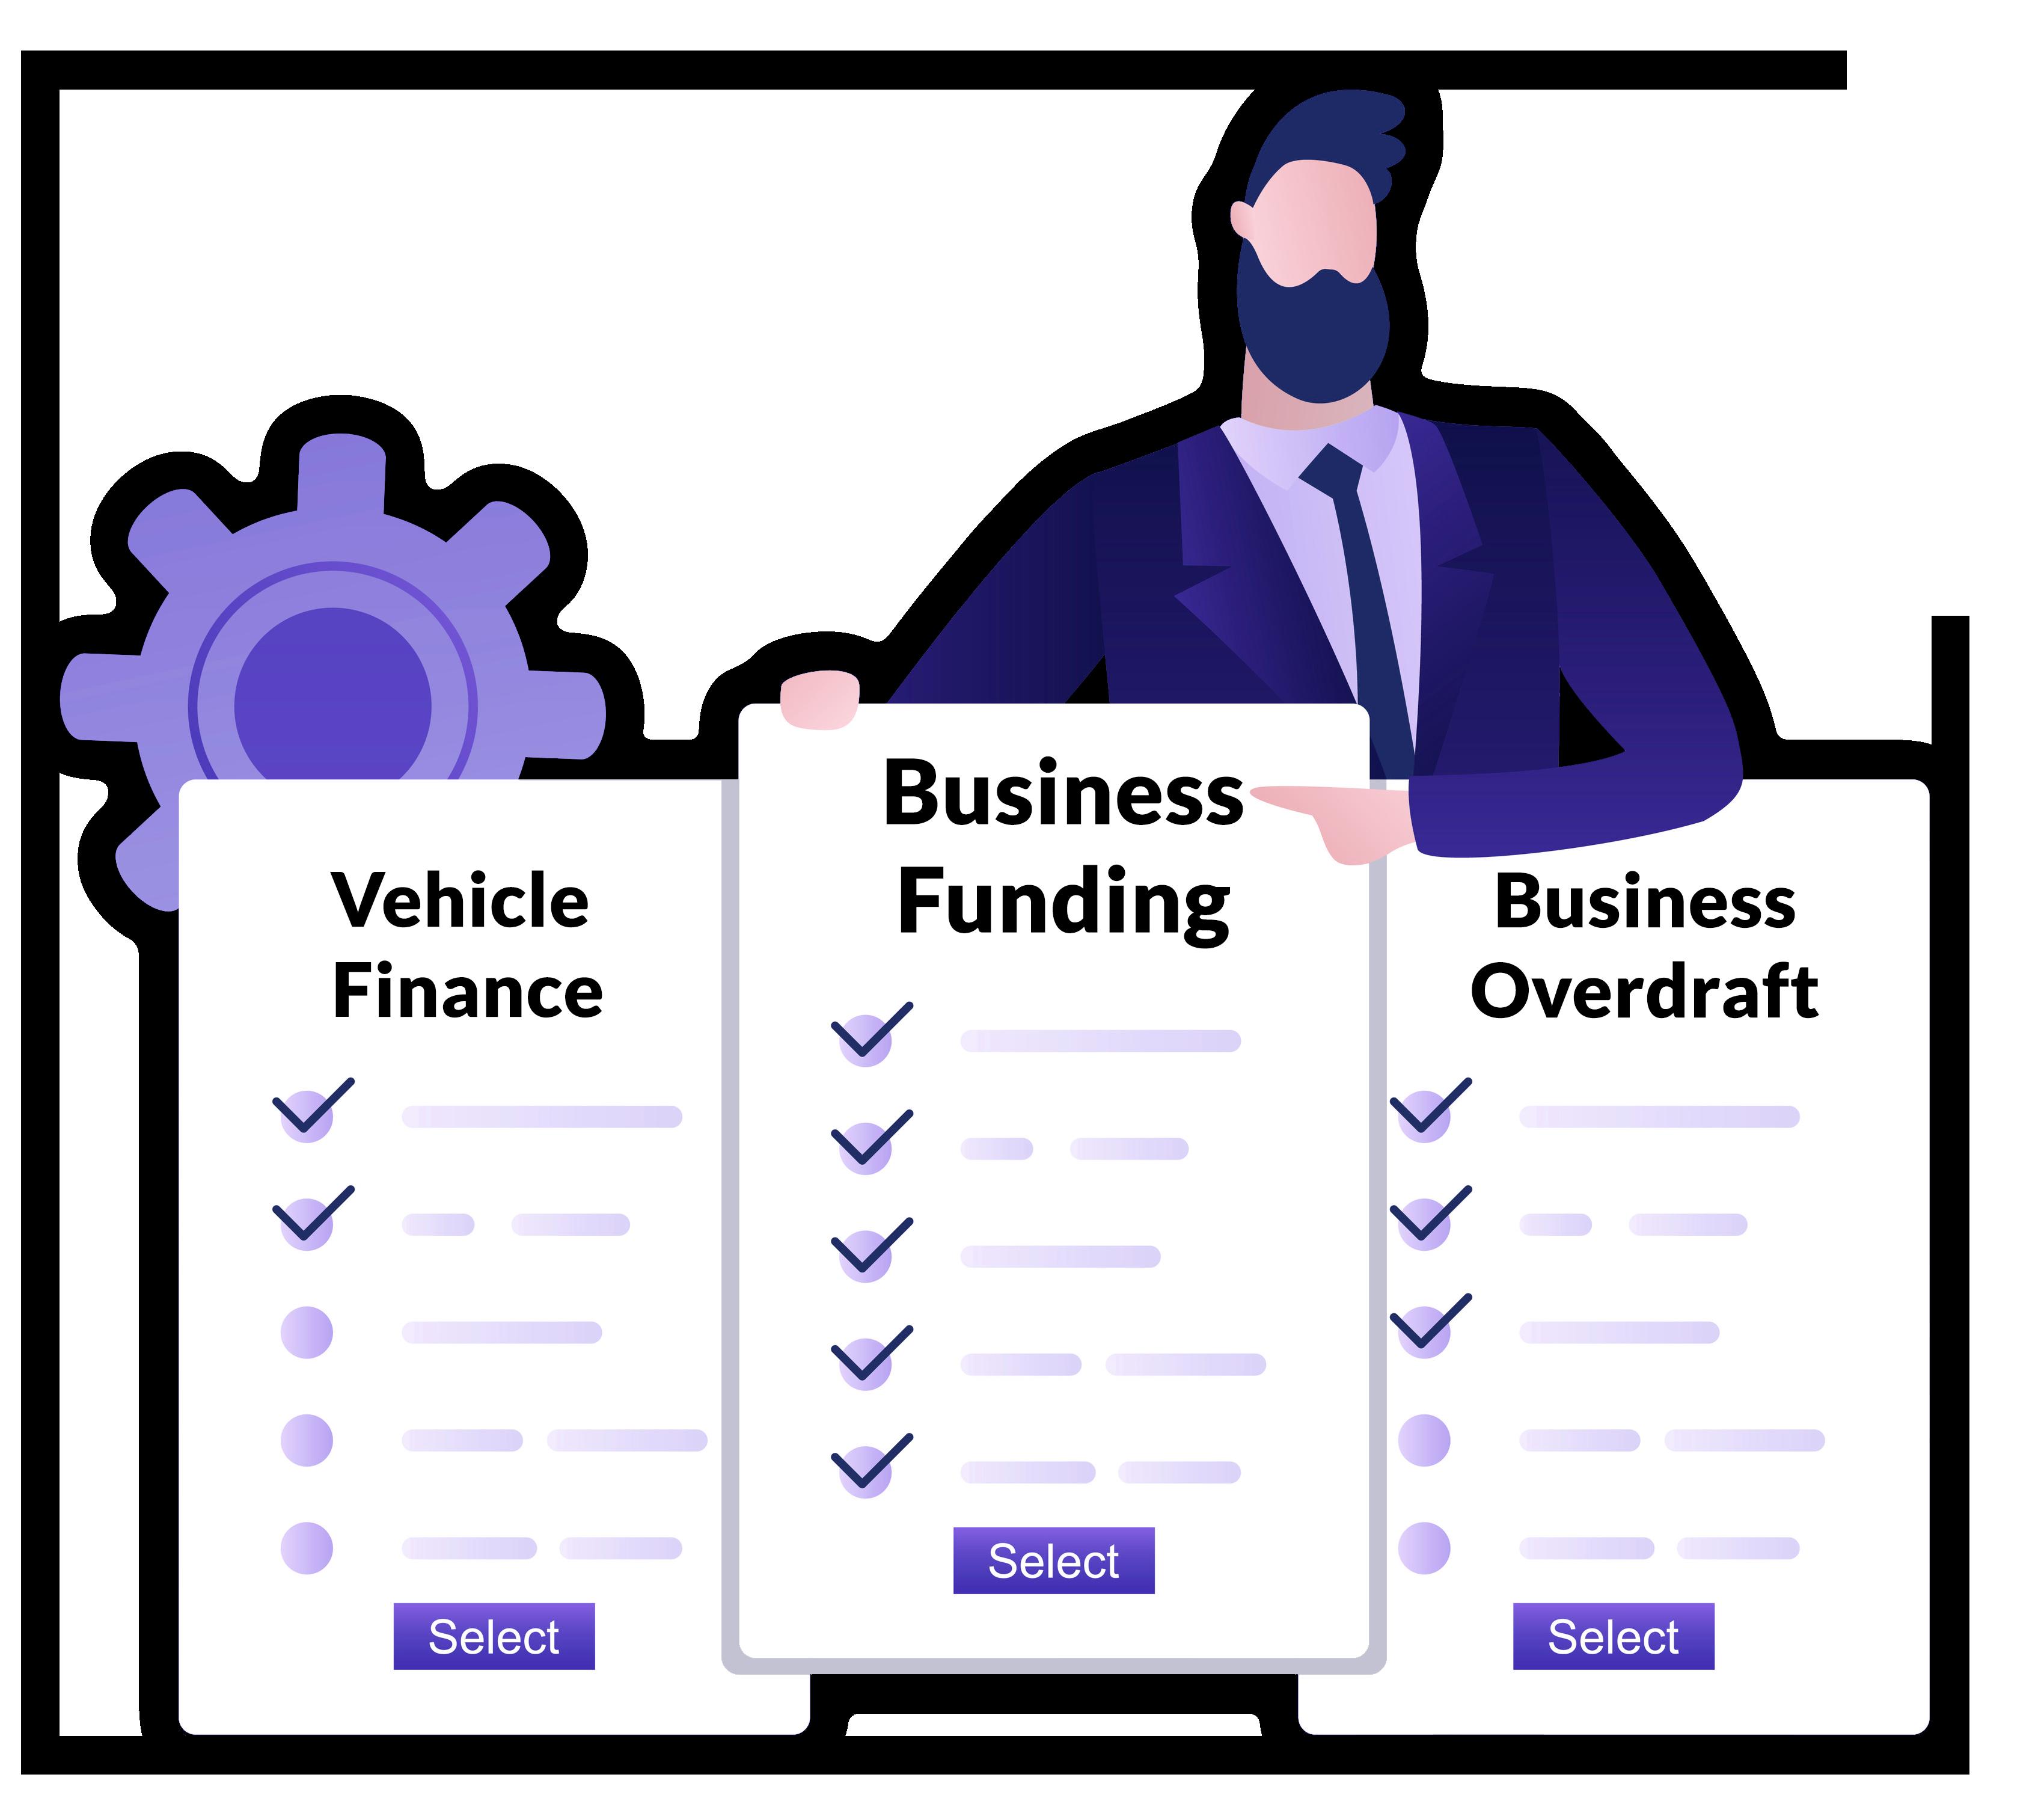 Business Funding Finance Loans